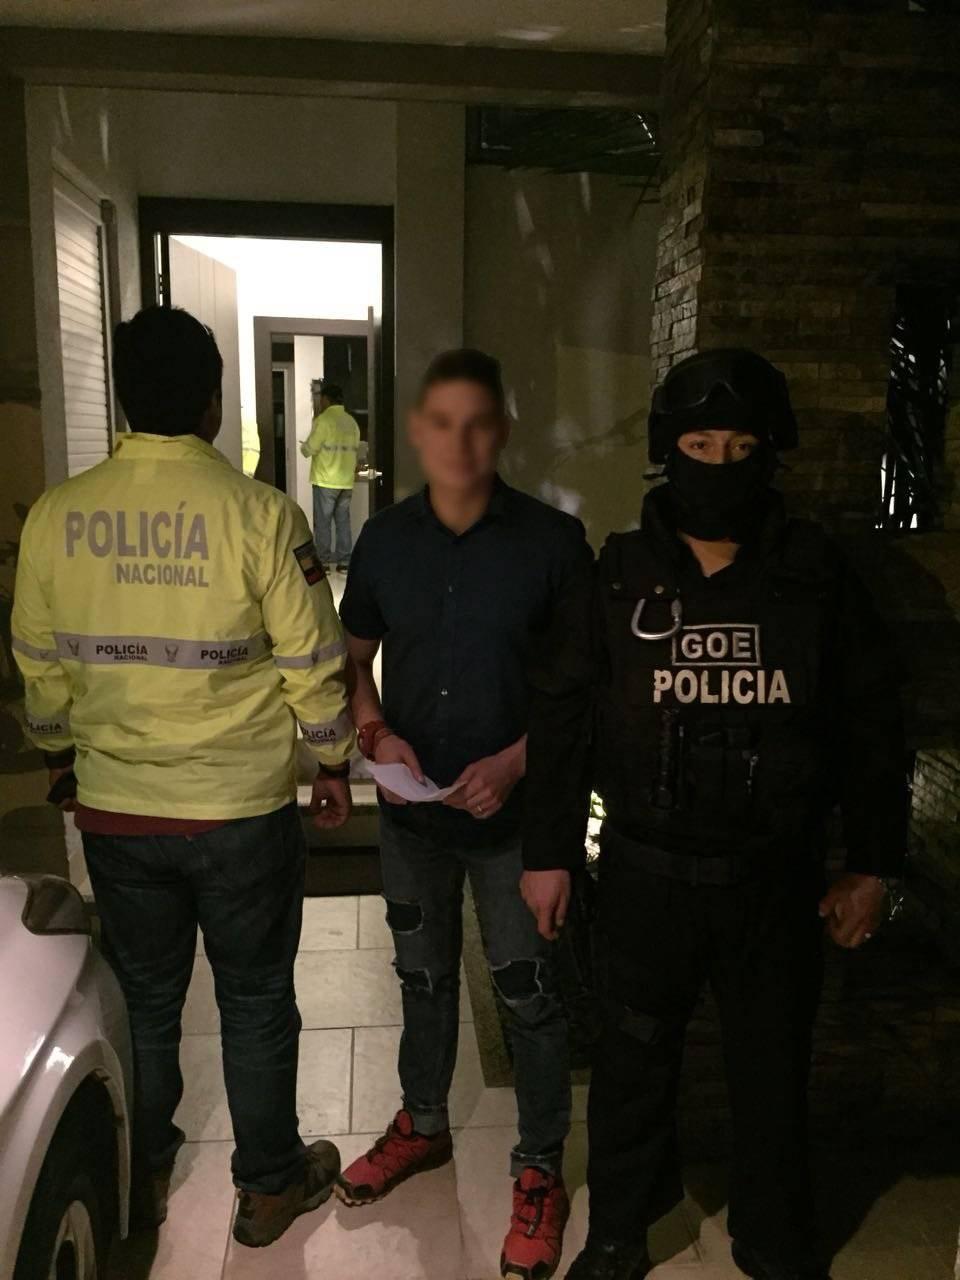 Detención Iván Espinel Twitter